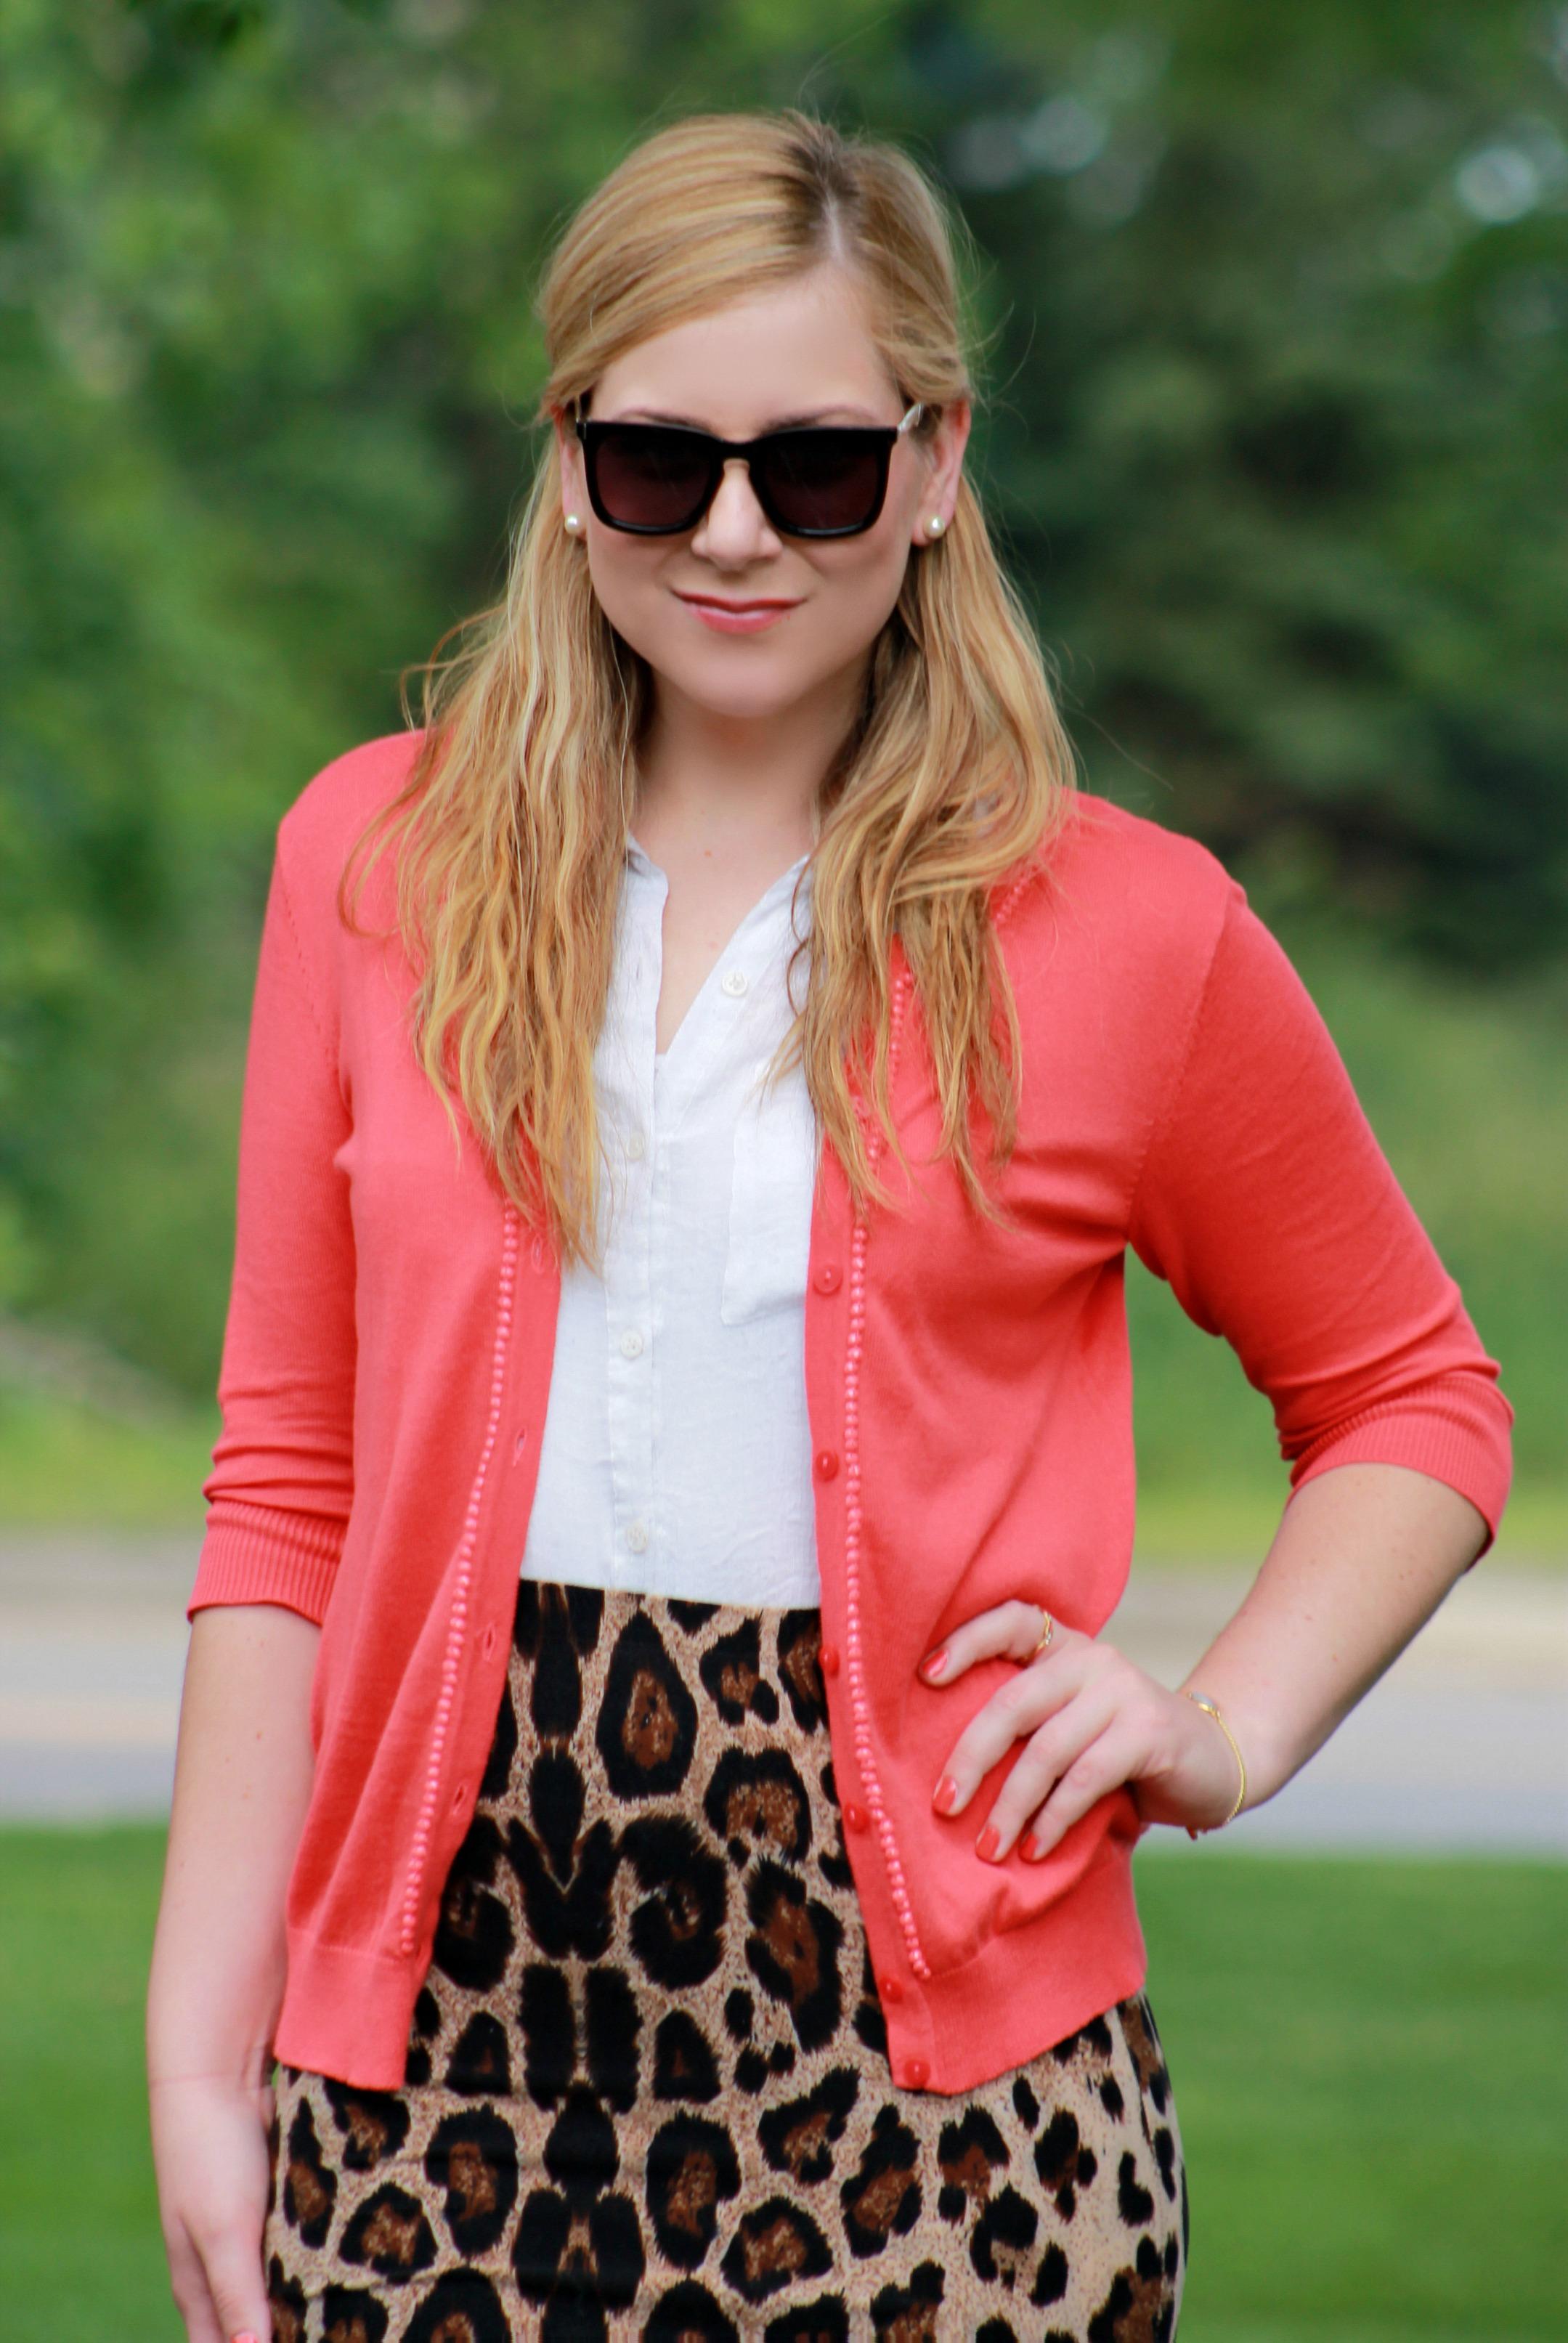 Leopard Print Skirt + Coral Cardigan